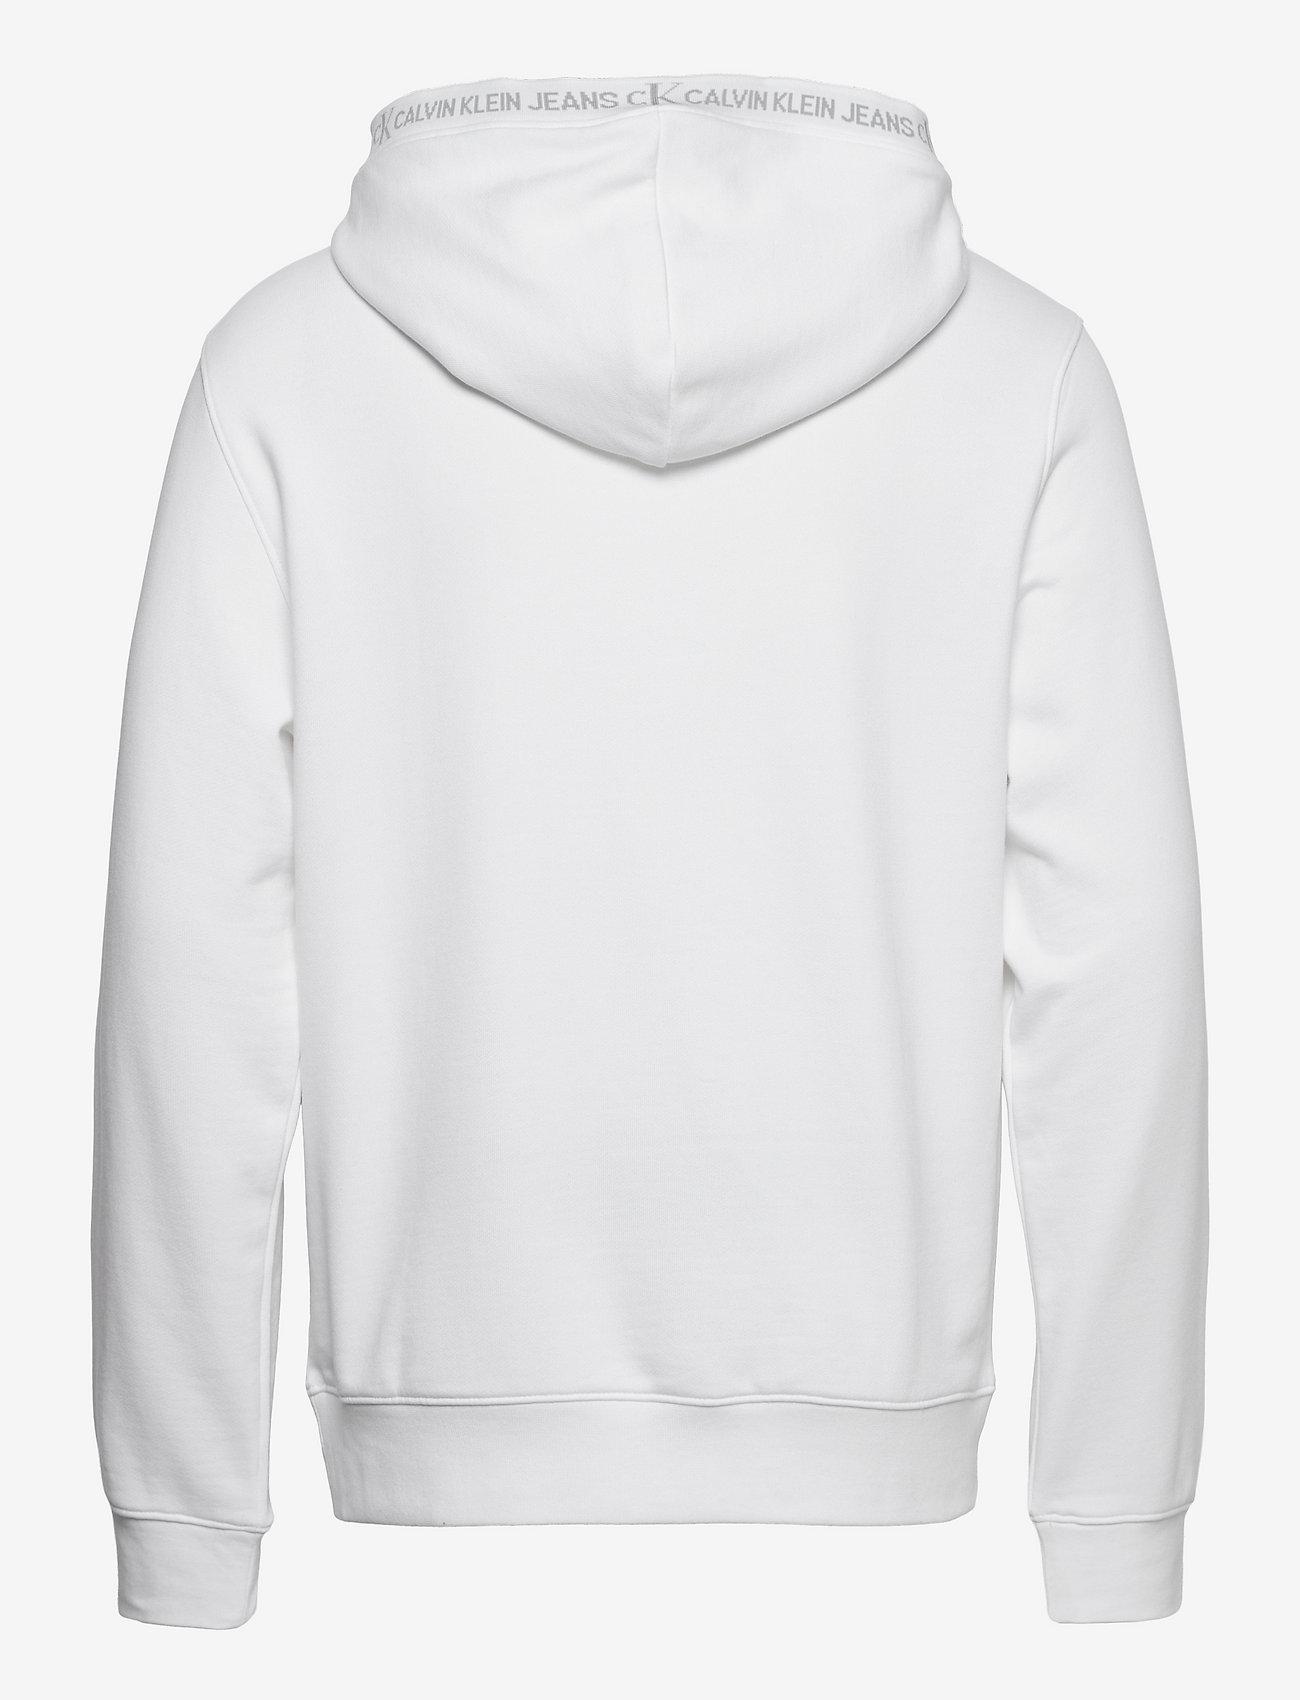 Calvin Klein Jeans - LOGO JACQUARD HOODIE - sweats à capuche - bright white - 1